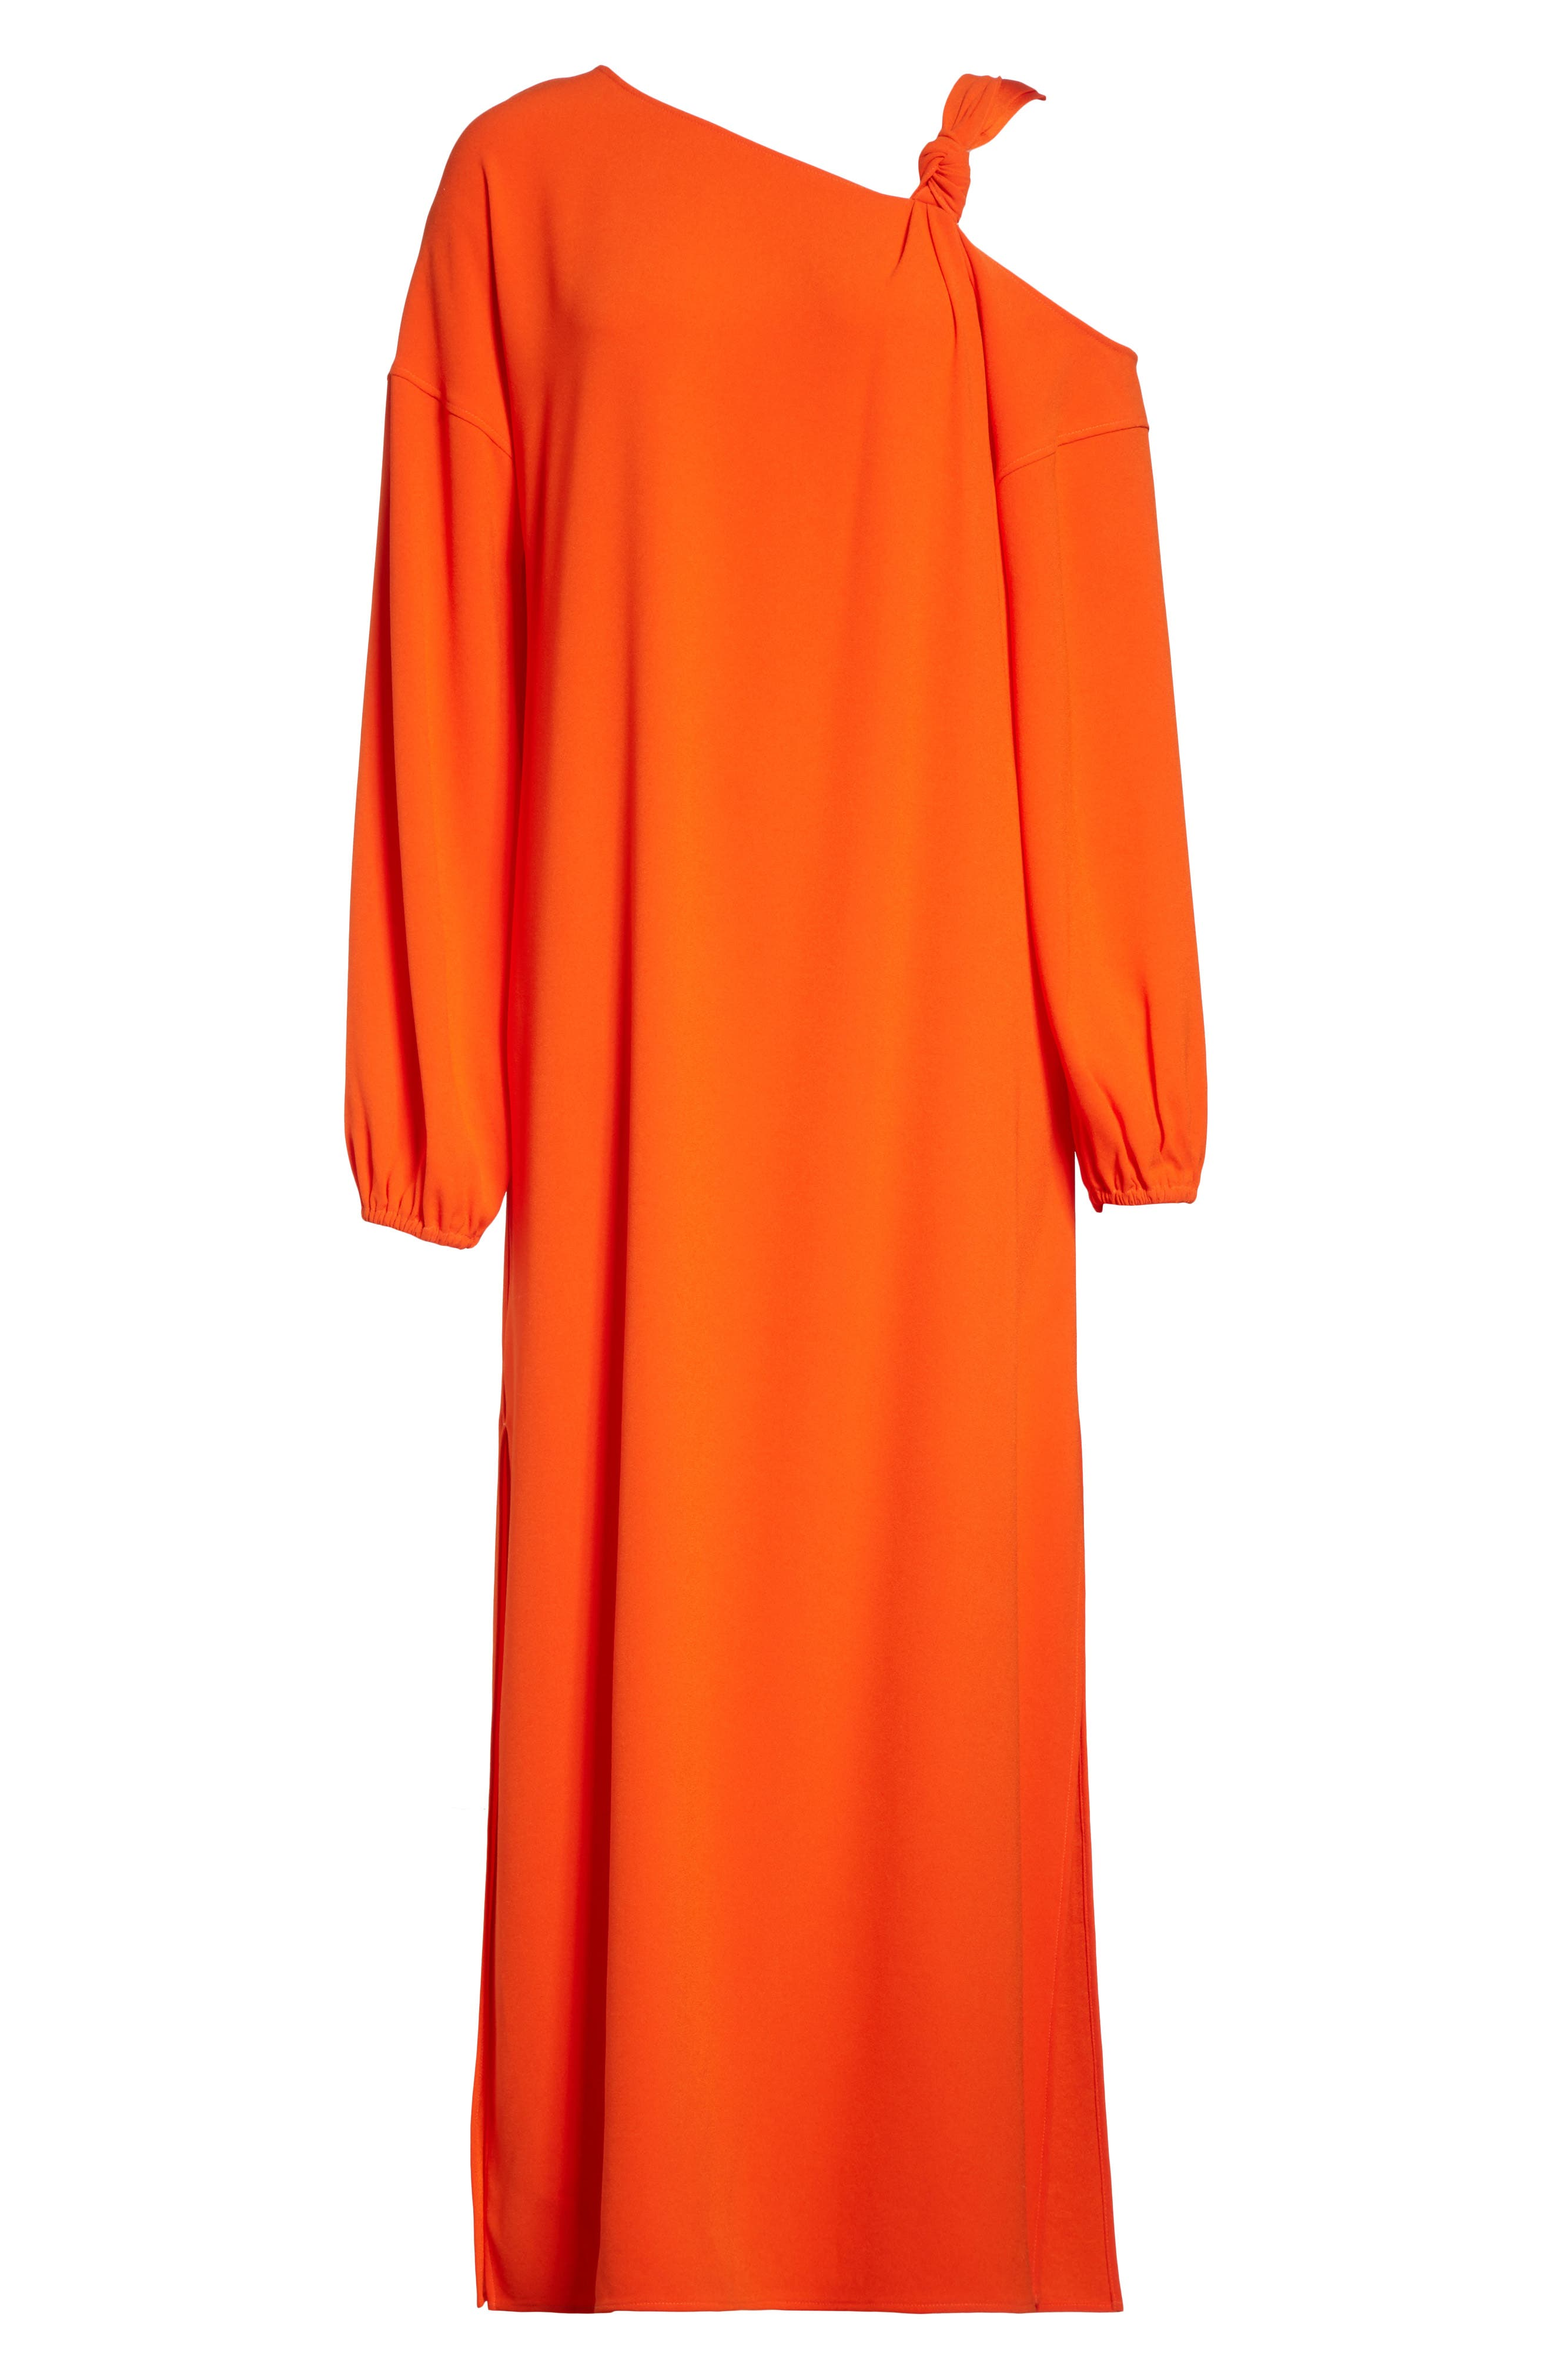 ELIZABETH AND JAMES,                             Shontae One-Shoulder Maxi Dress,                             Alternate thumbnail 6, color,                             807